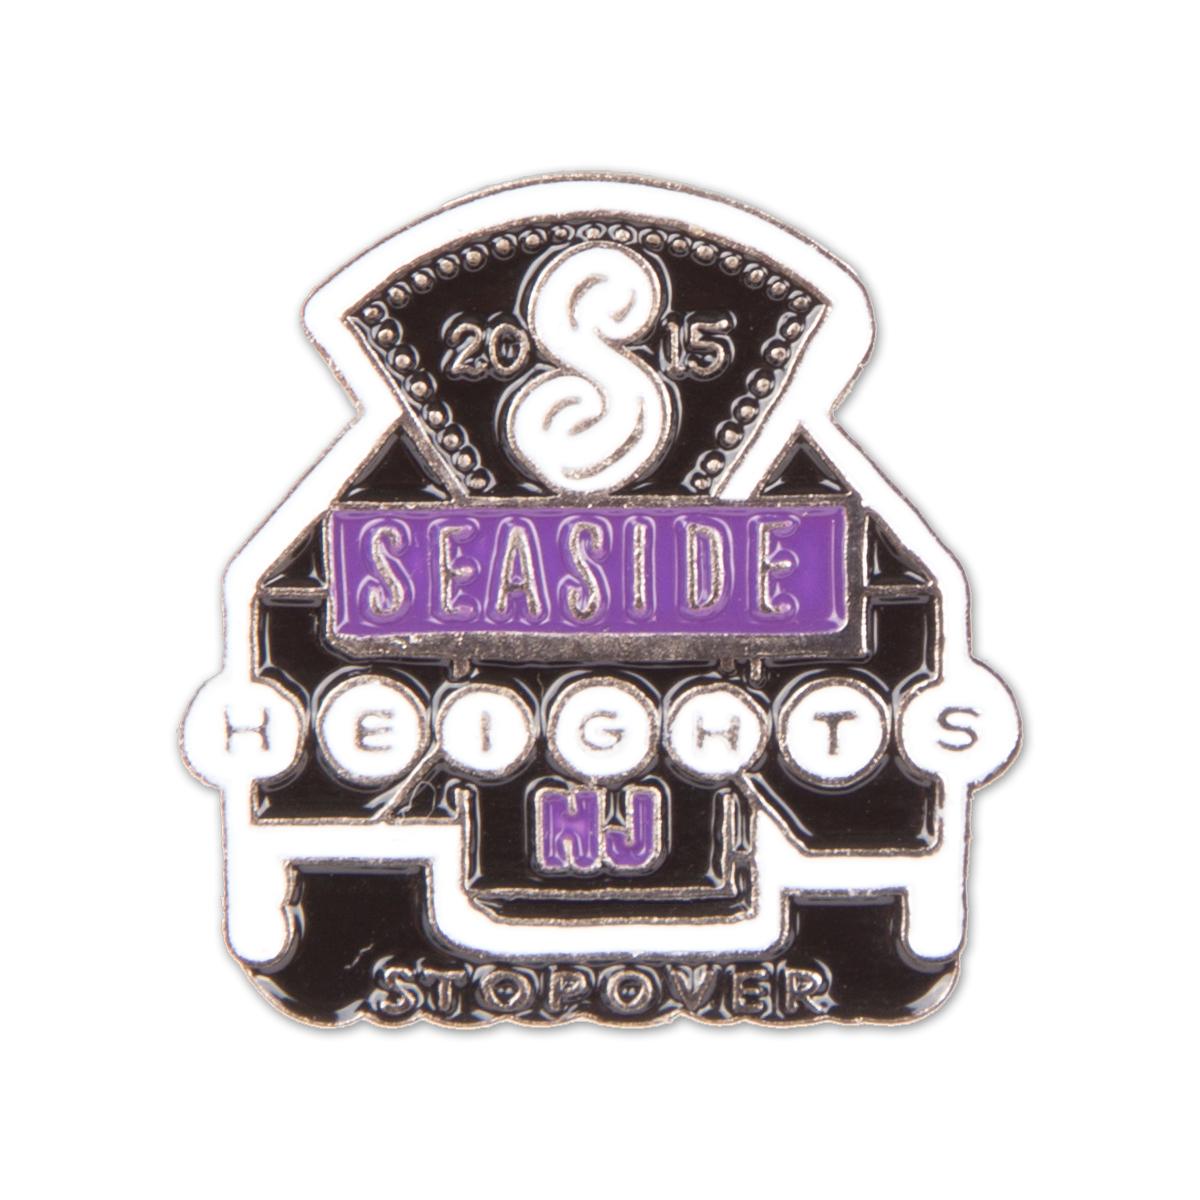 Seaside Heights Lapel Pin